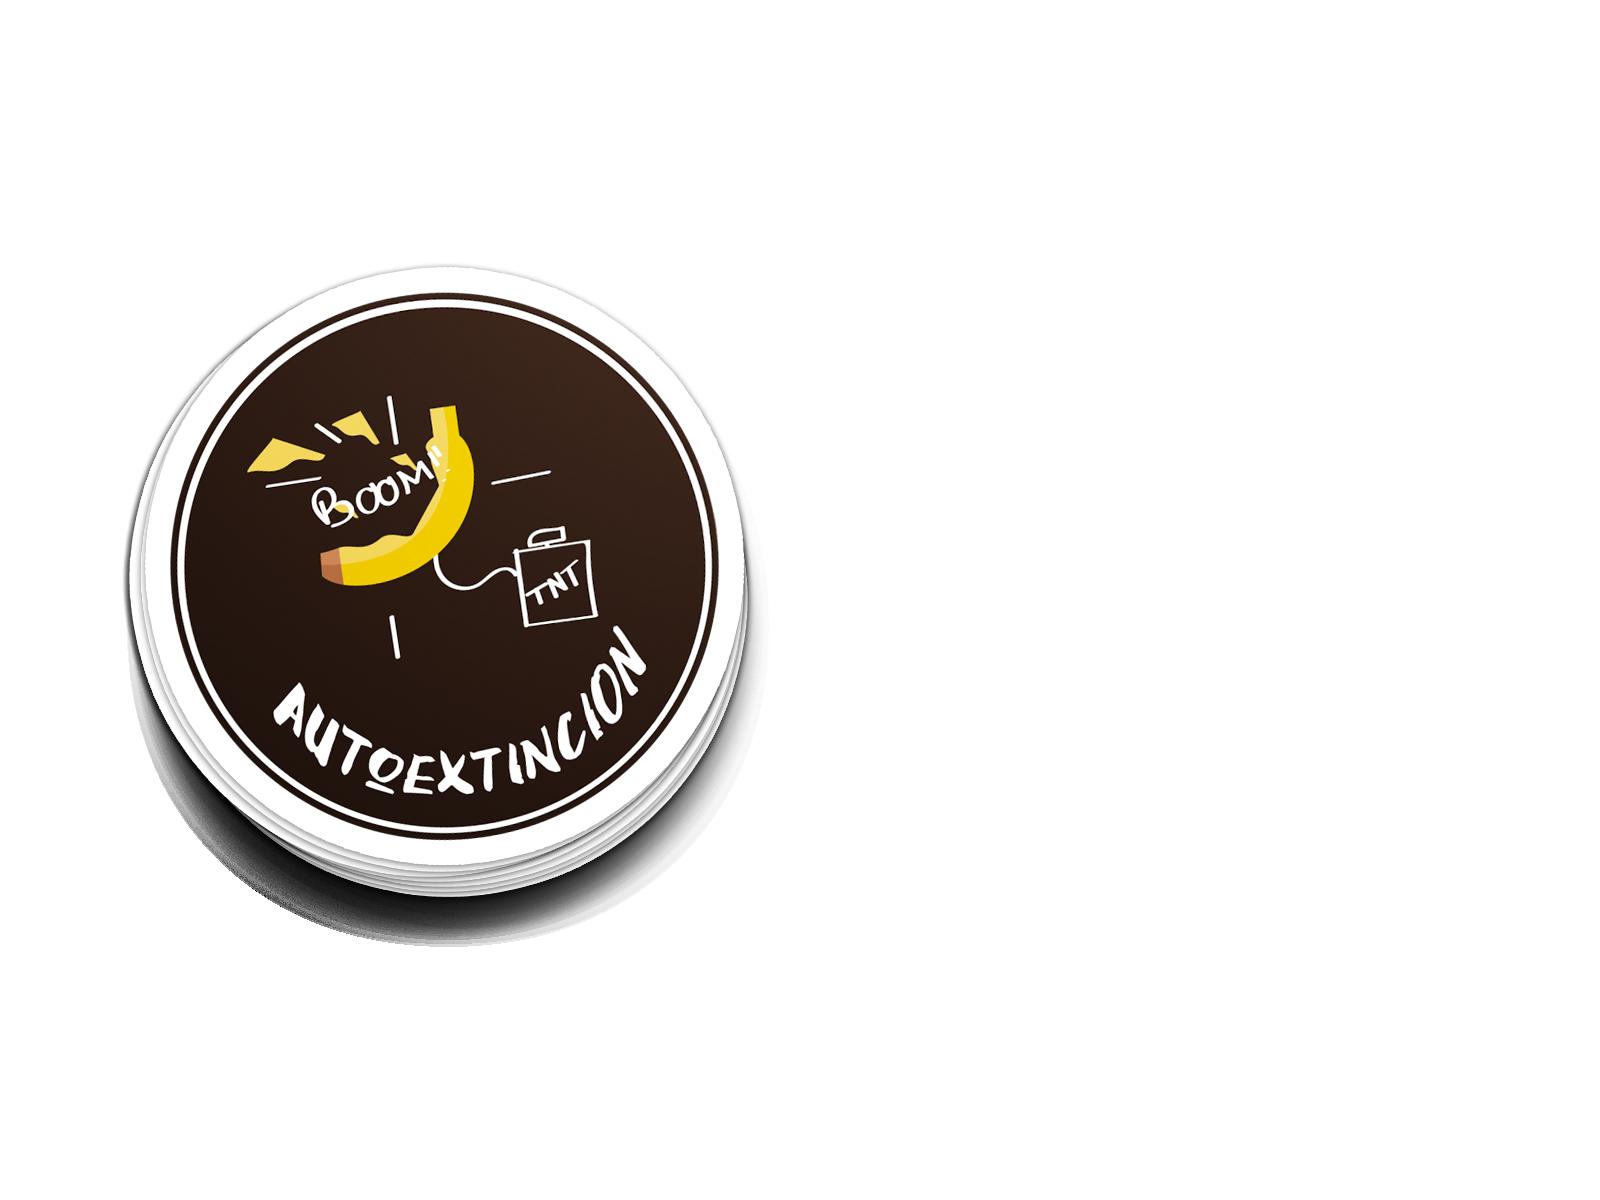 Stickers Arnau Griso by Andrea Cabrero Lobato - Creative Work